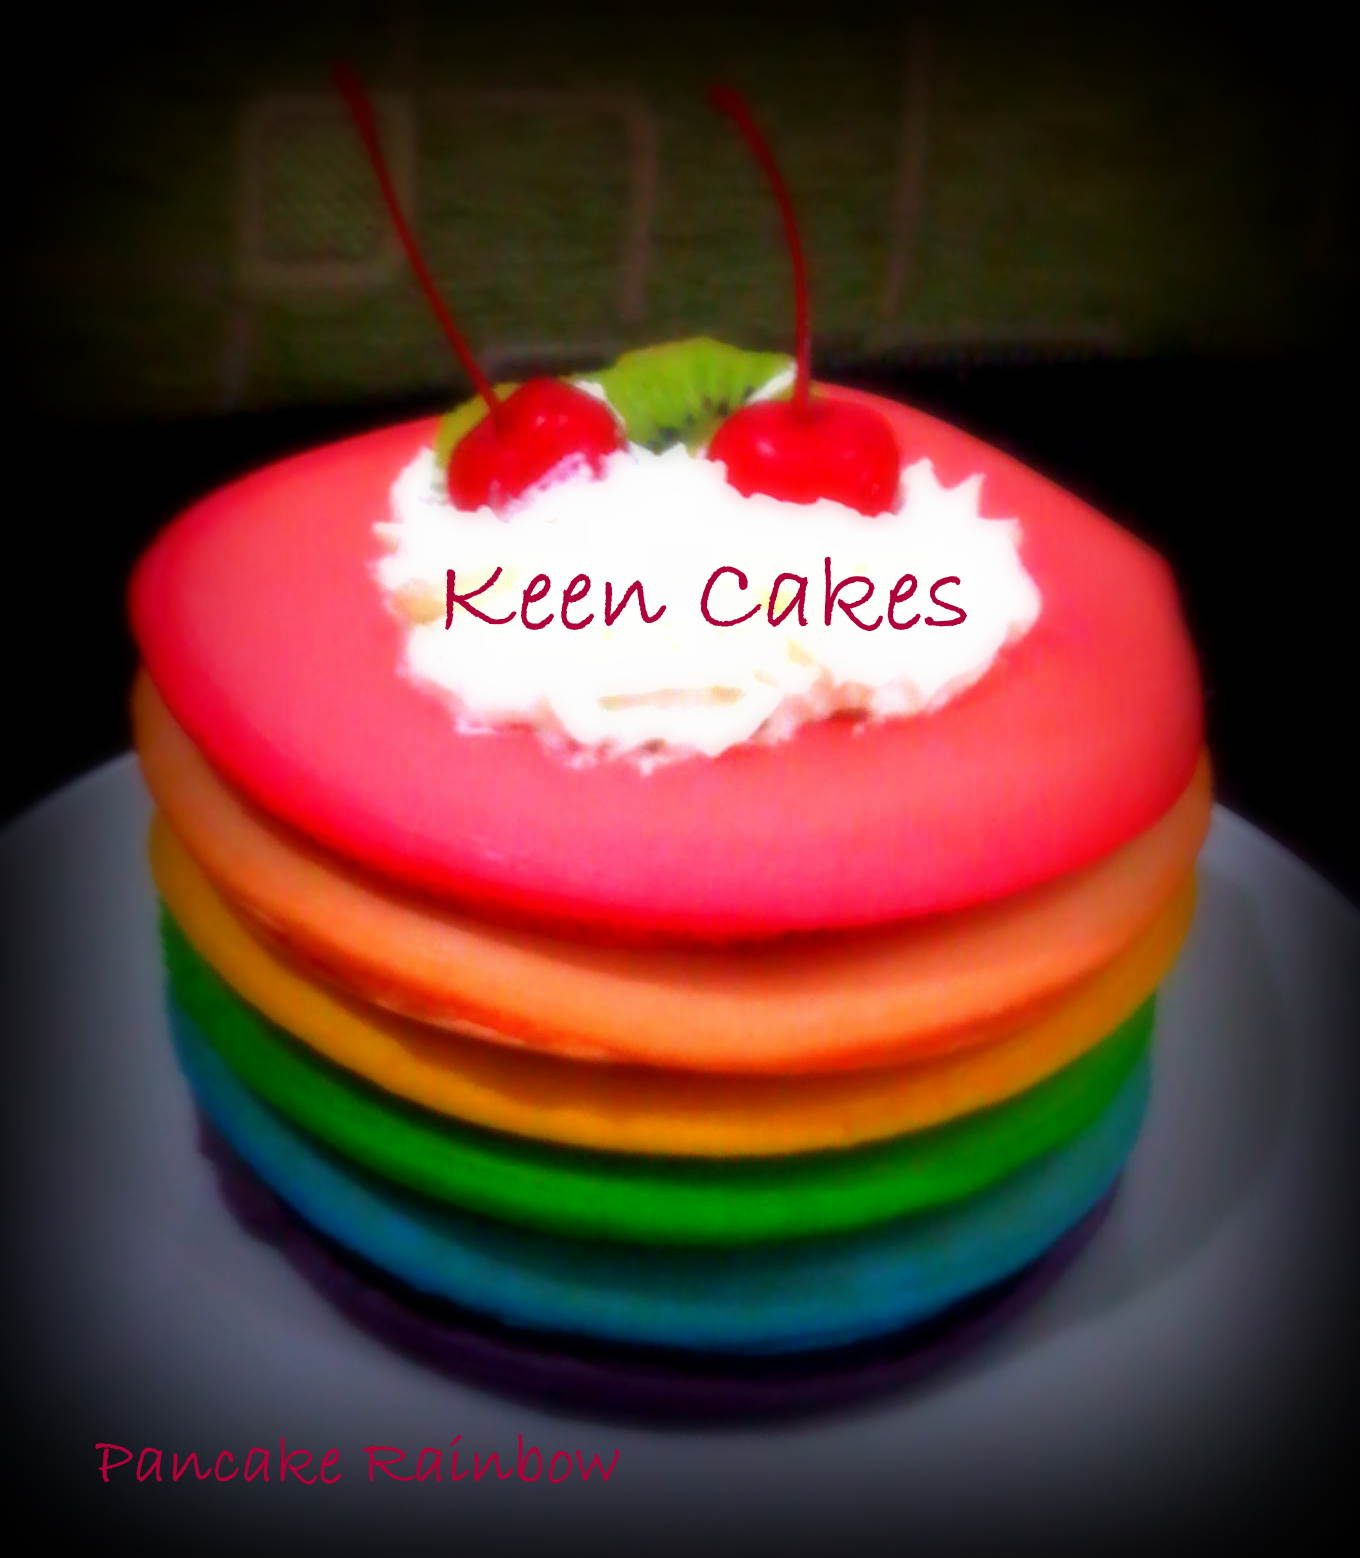 Keen Cakes Pancake Rainbow